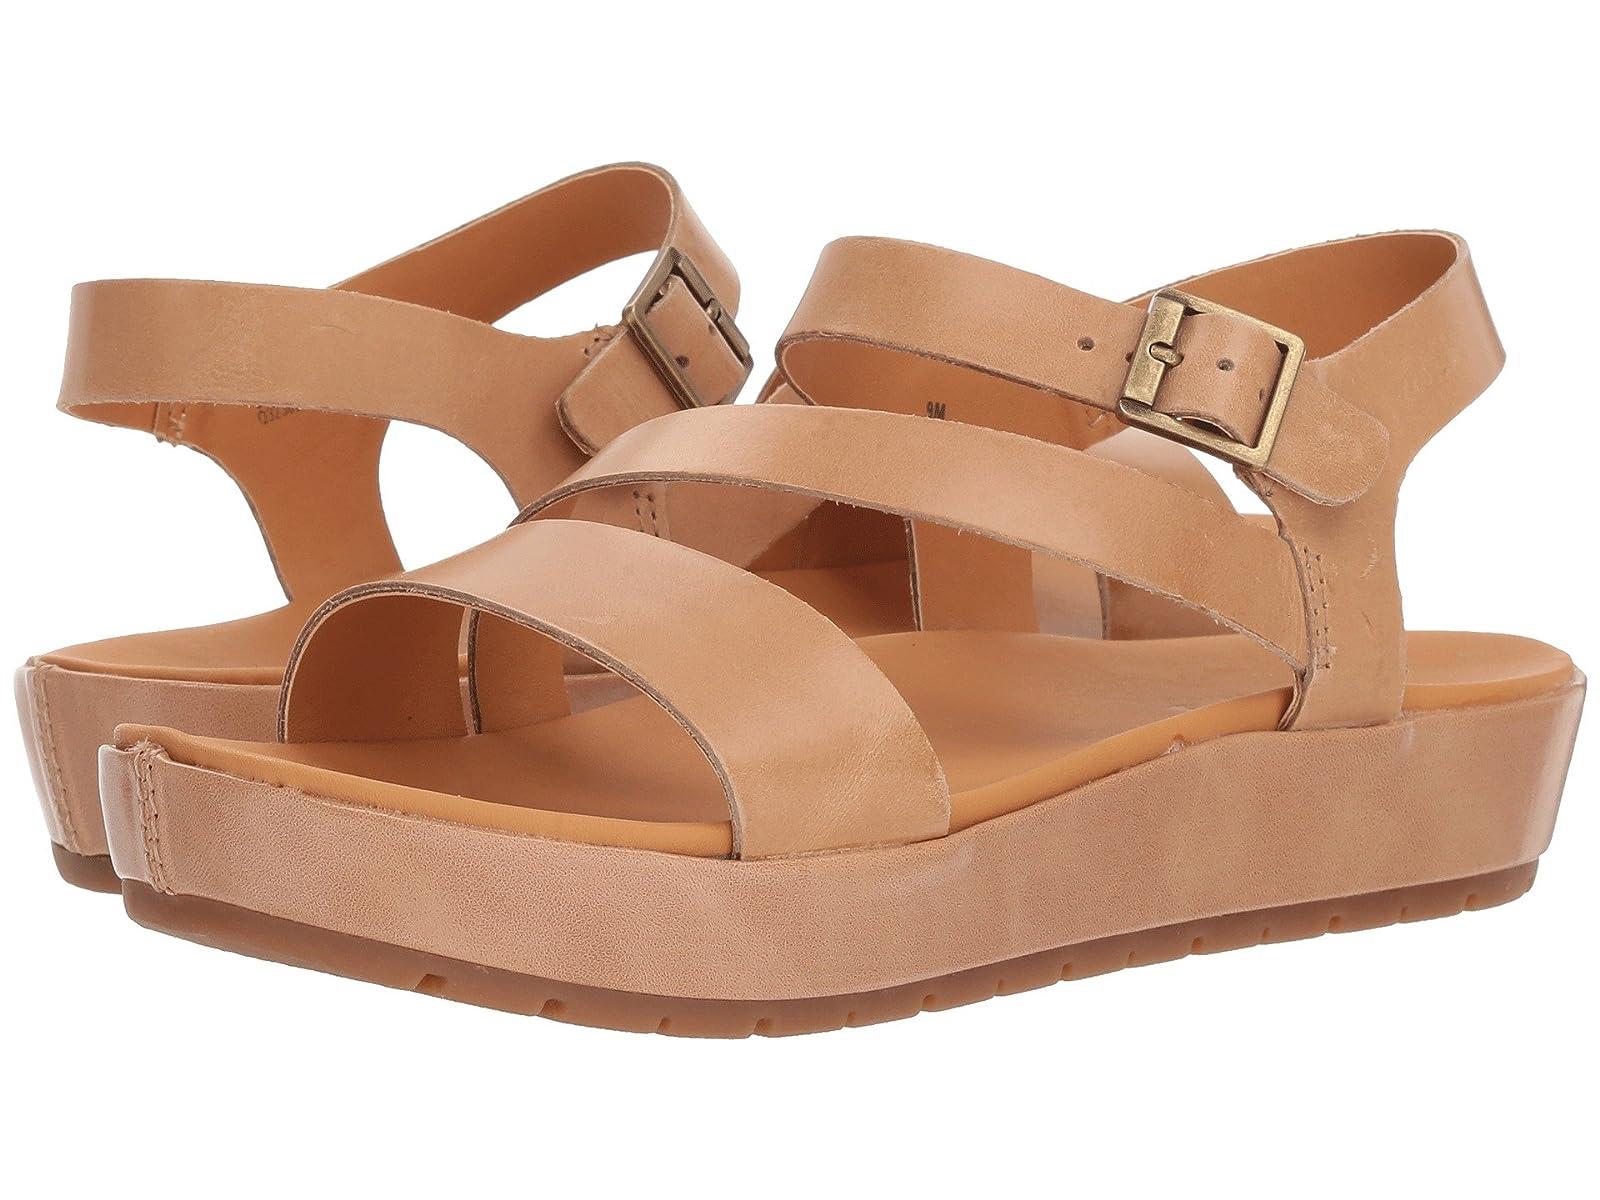 Korks TiffaniCheap and distinctive eye-catching shoes